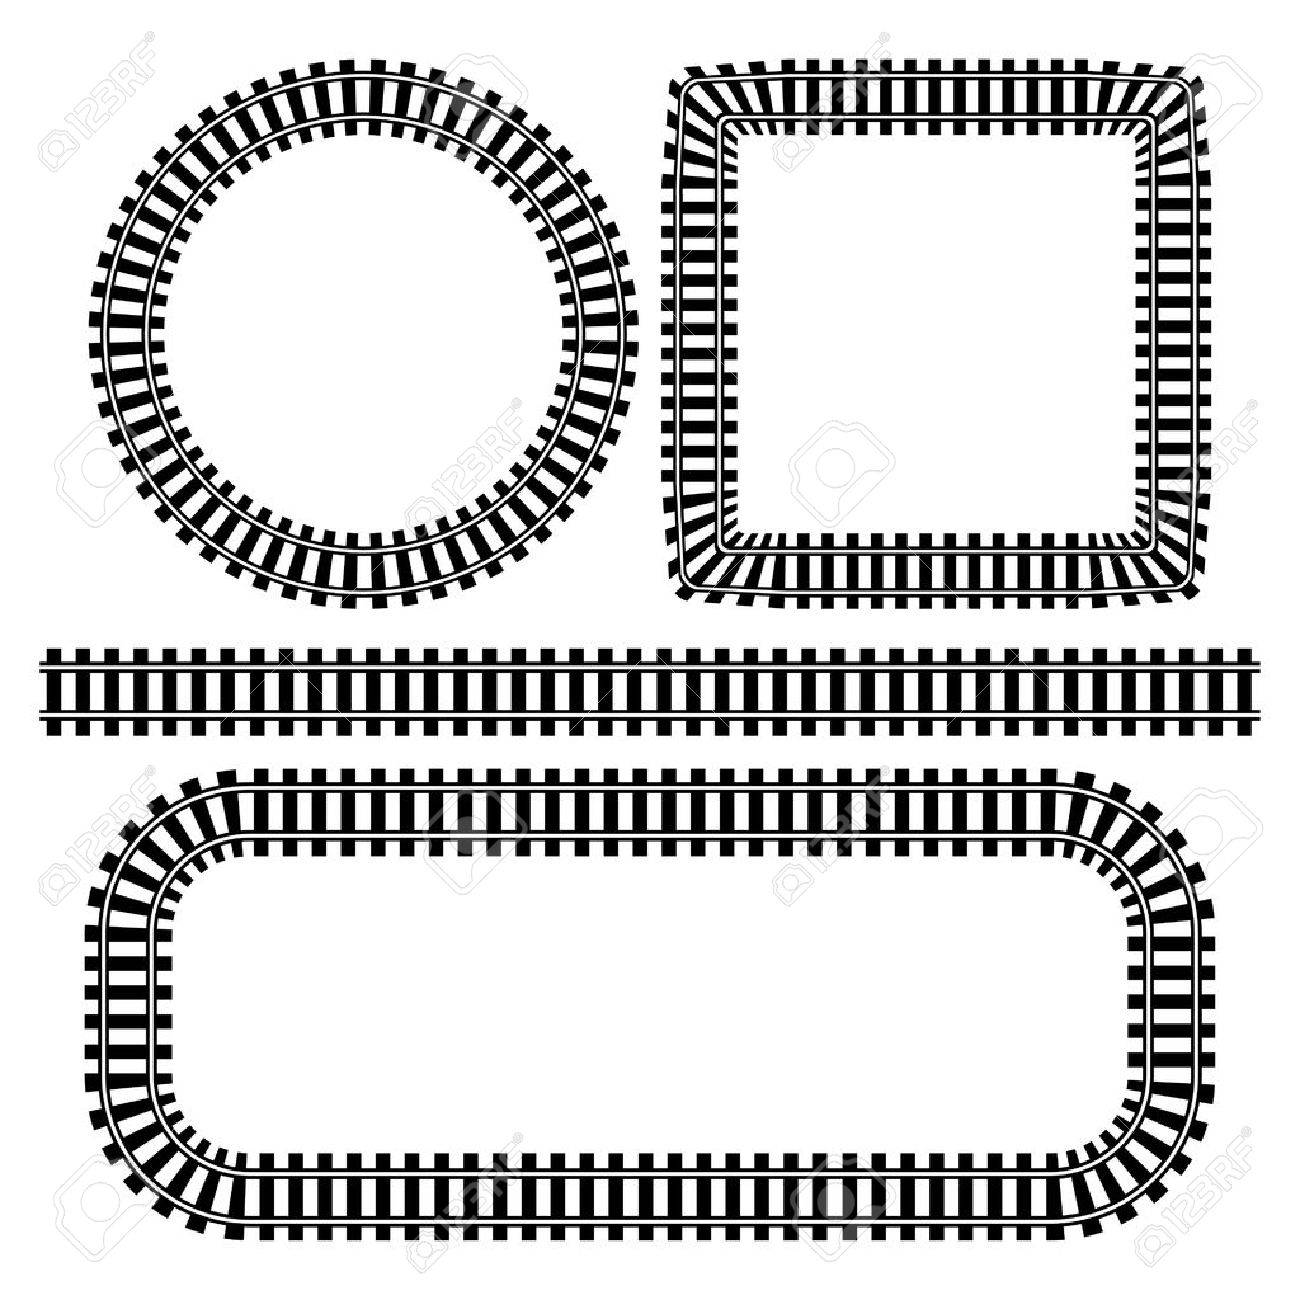 Train Tracks - 39437039